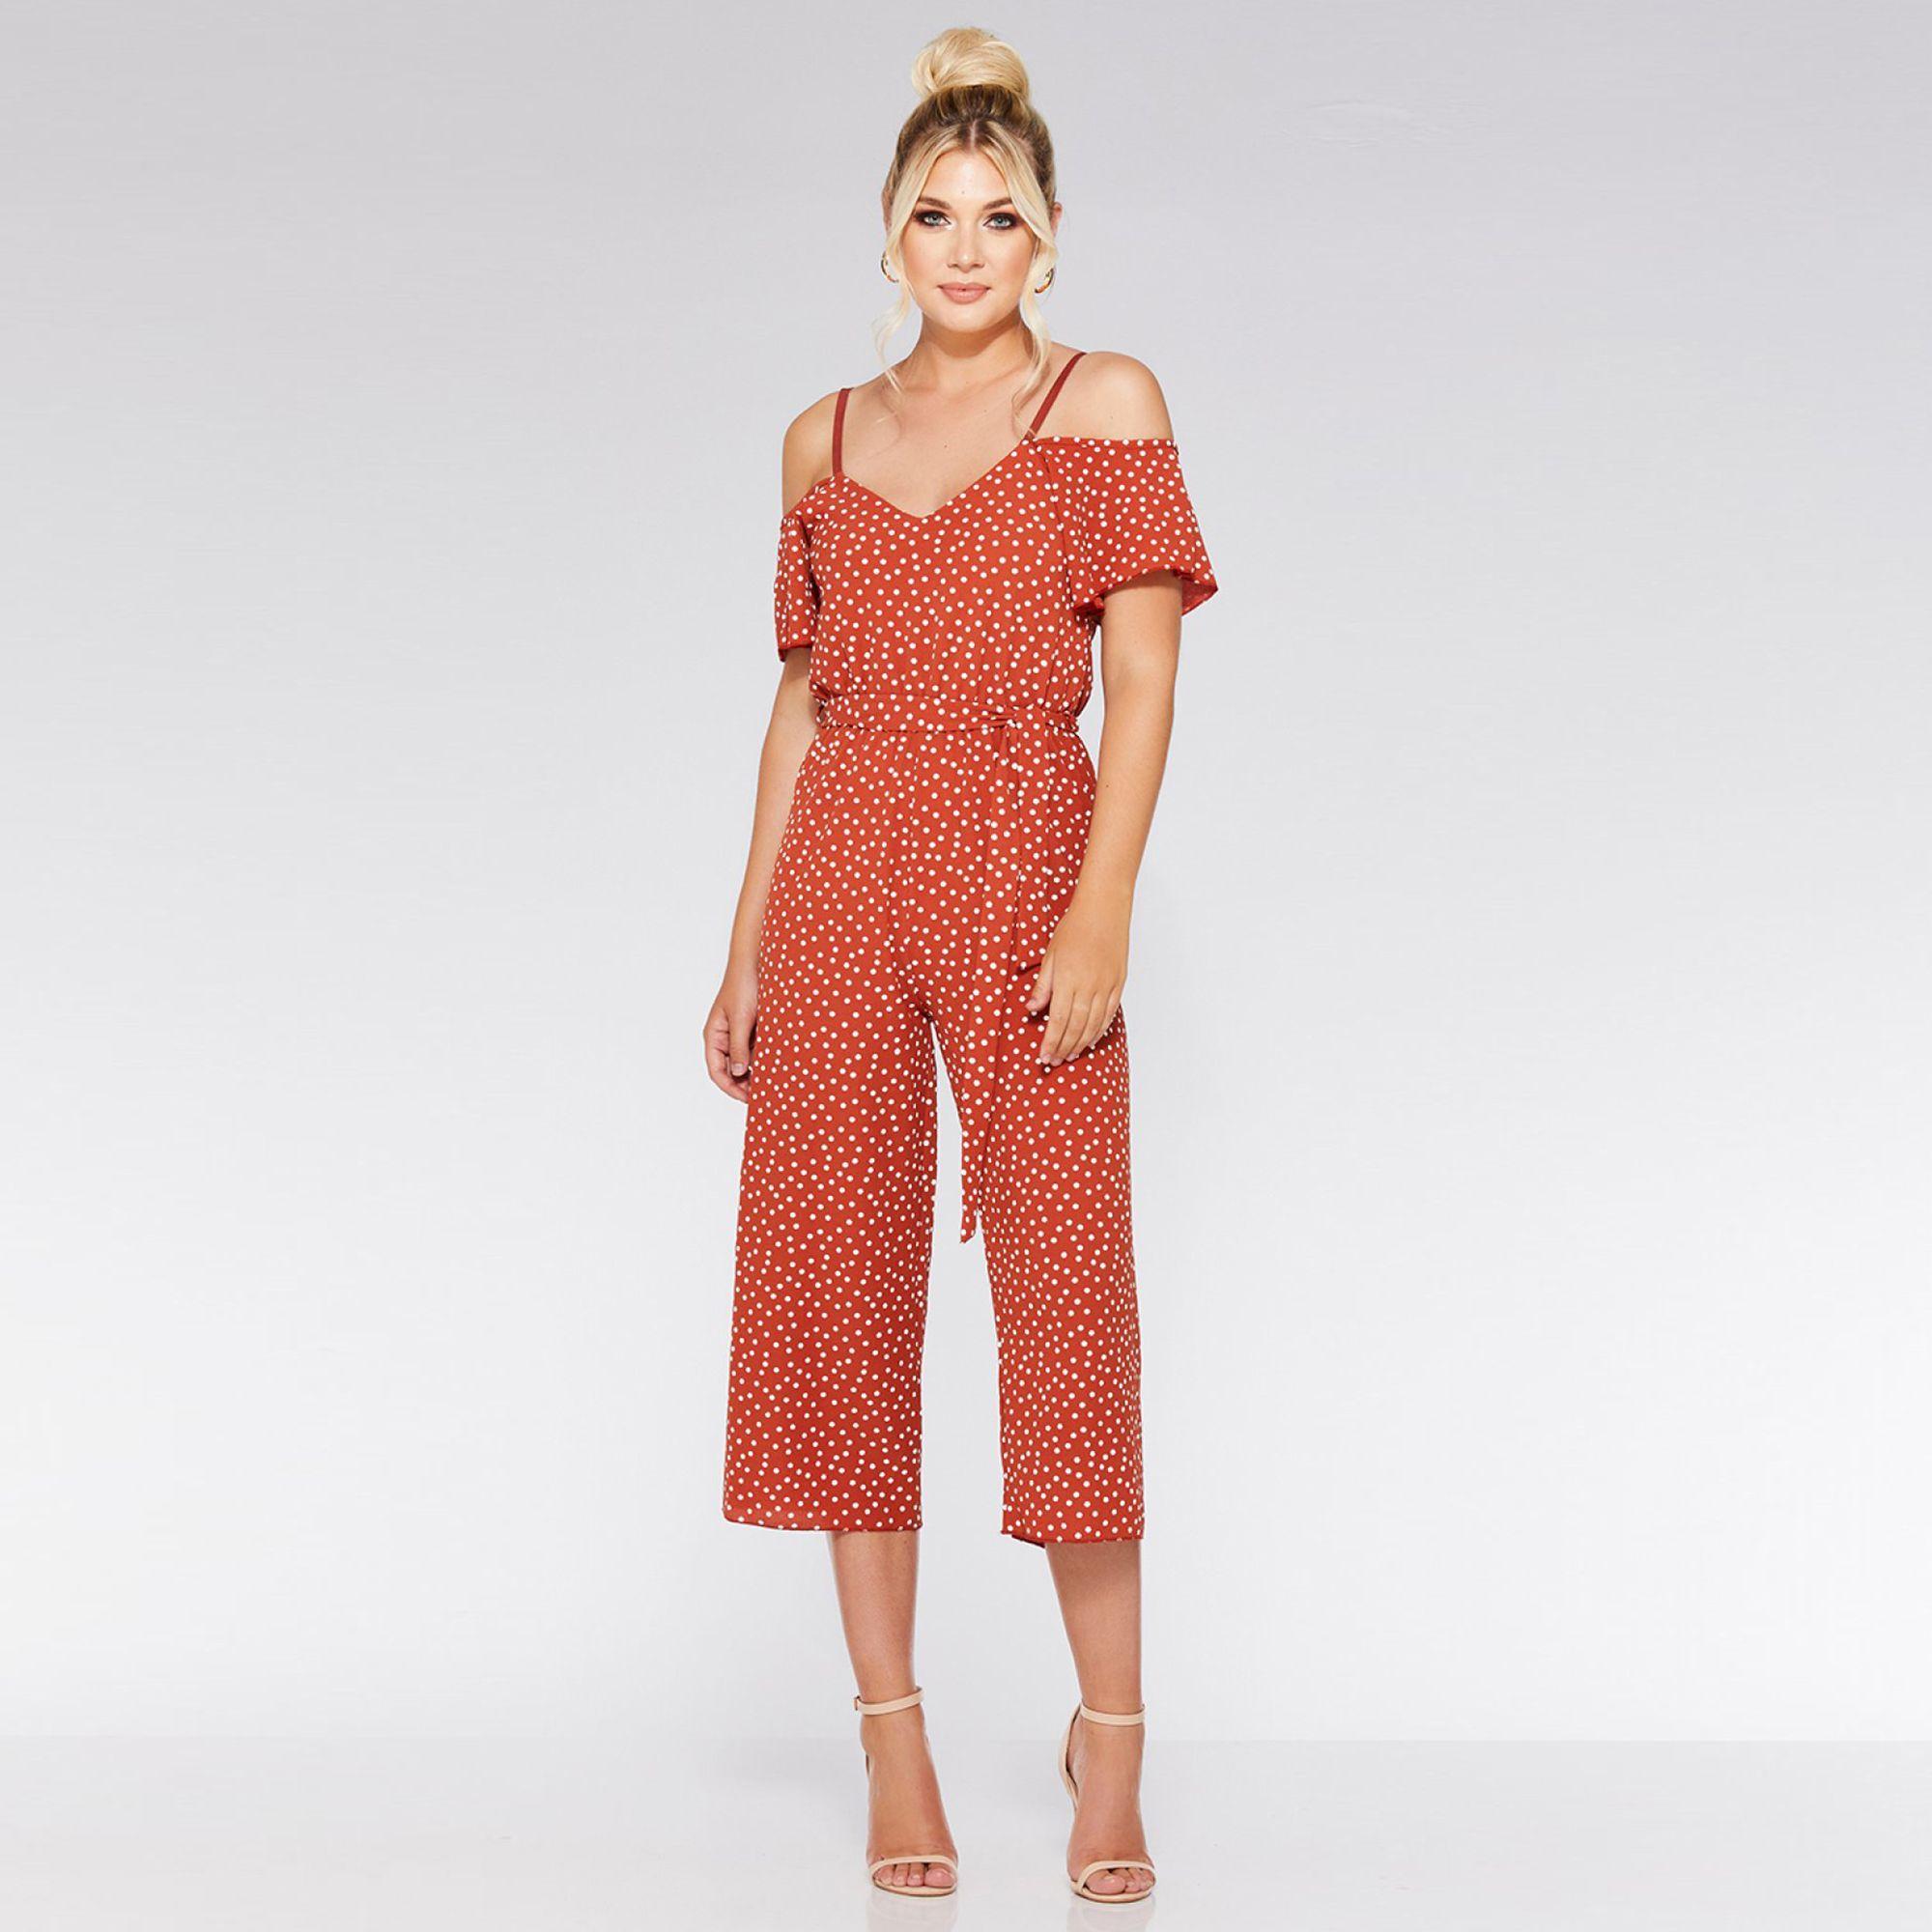 62a583a9f22 Quiz Rust Crepe Polka Dot Culottes Jumpsuit in Orange - Lyst